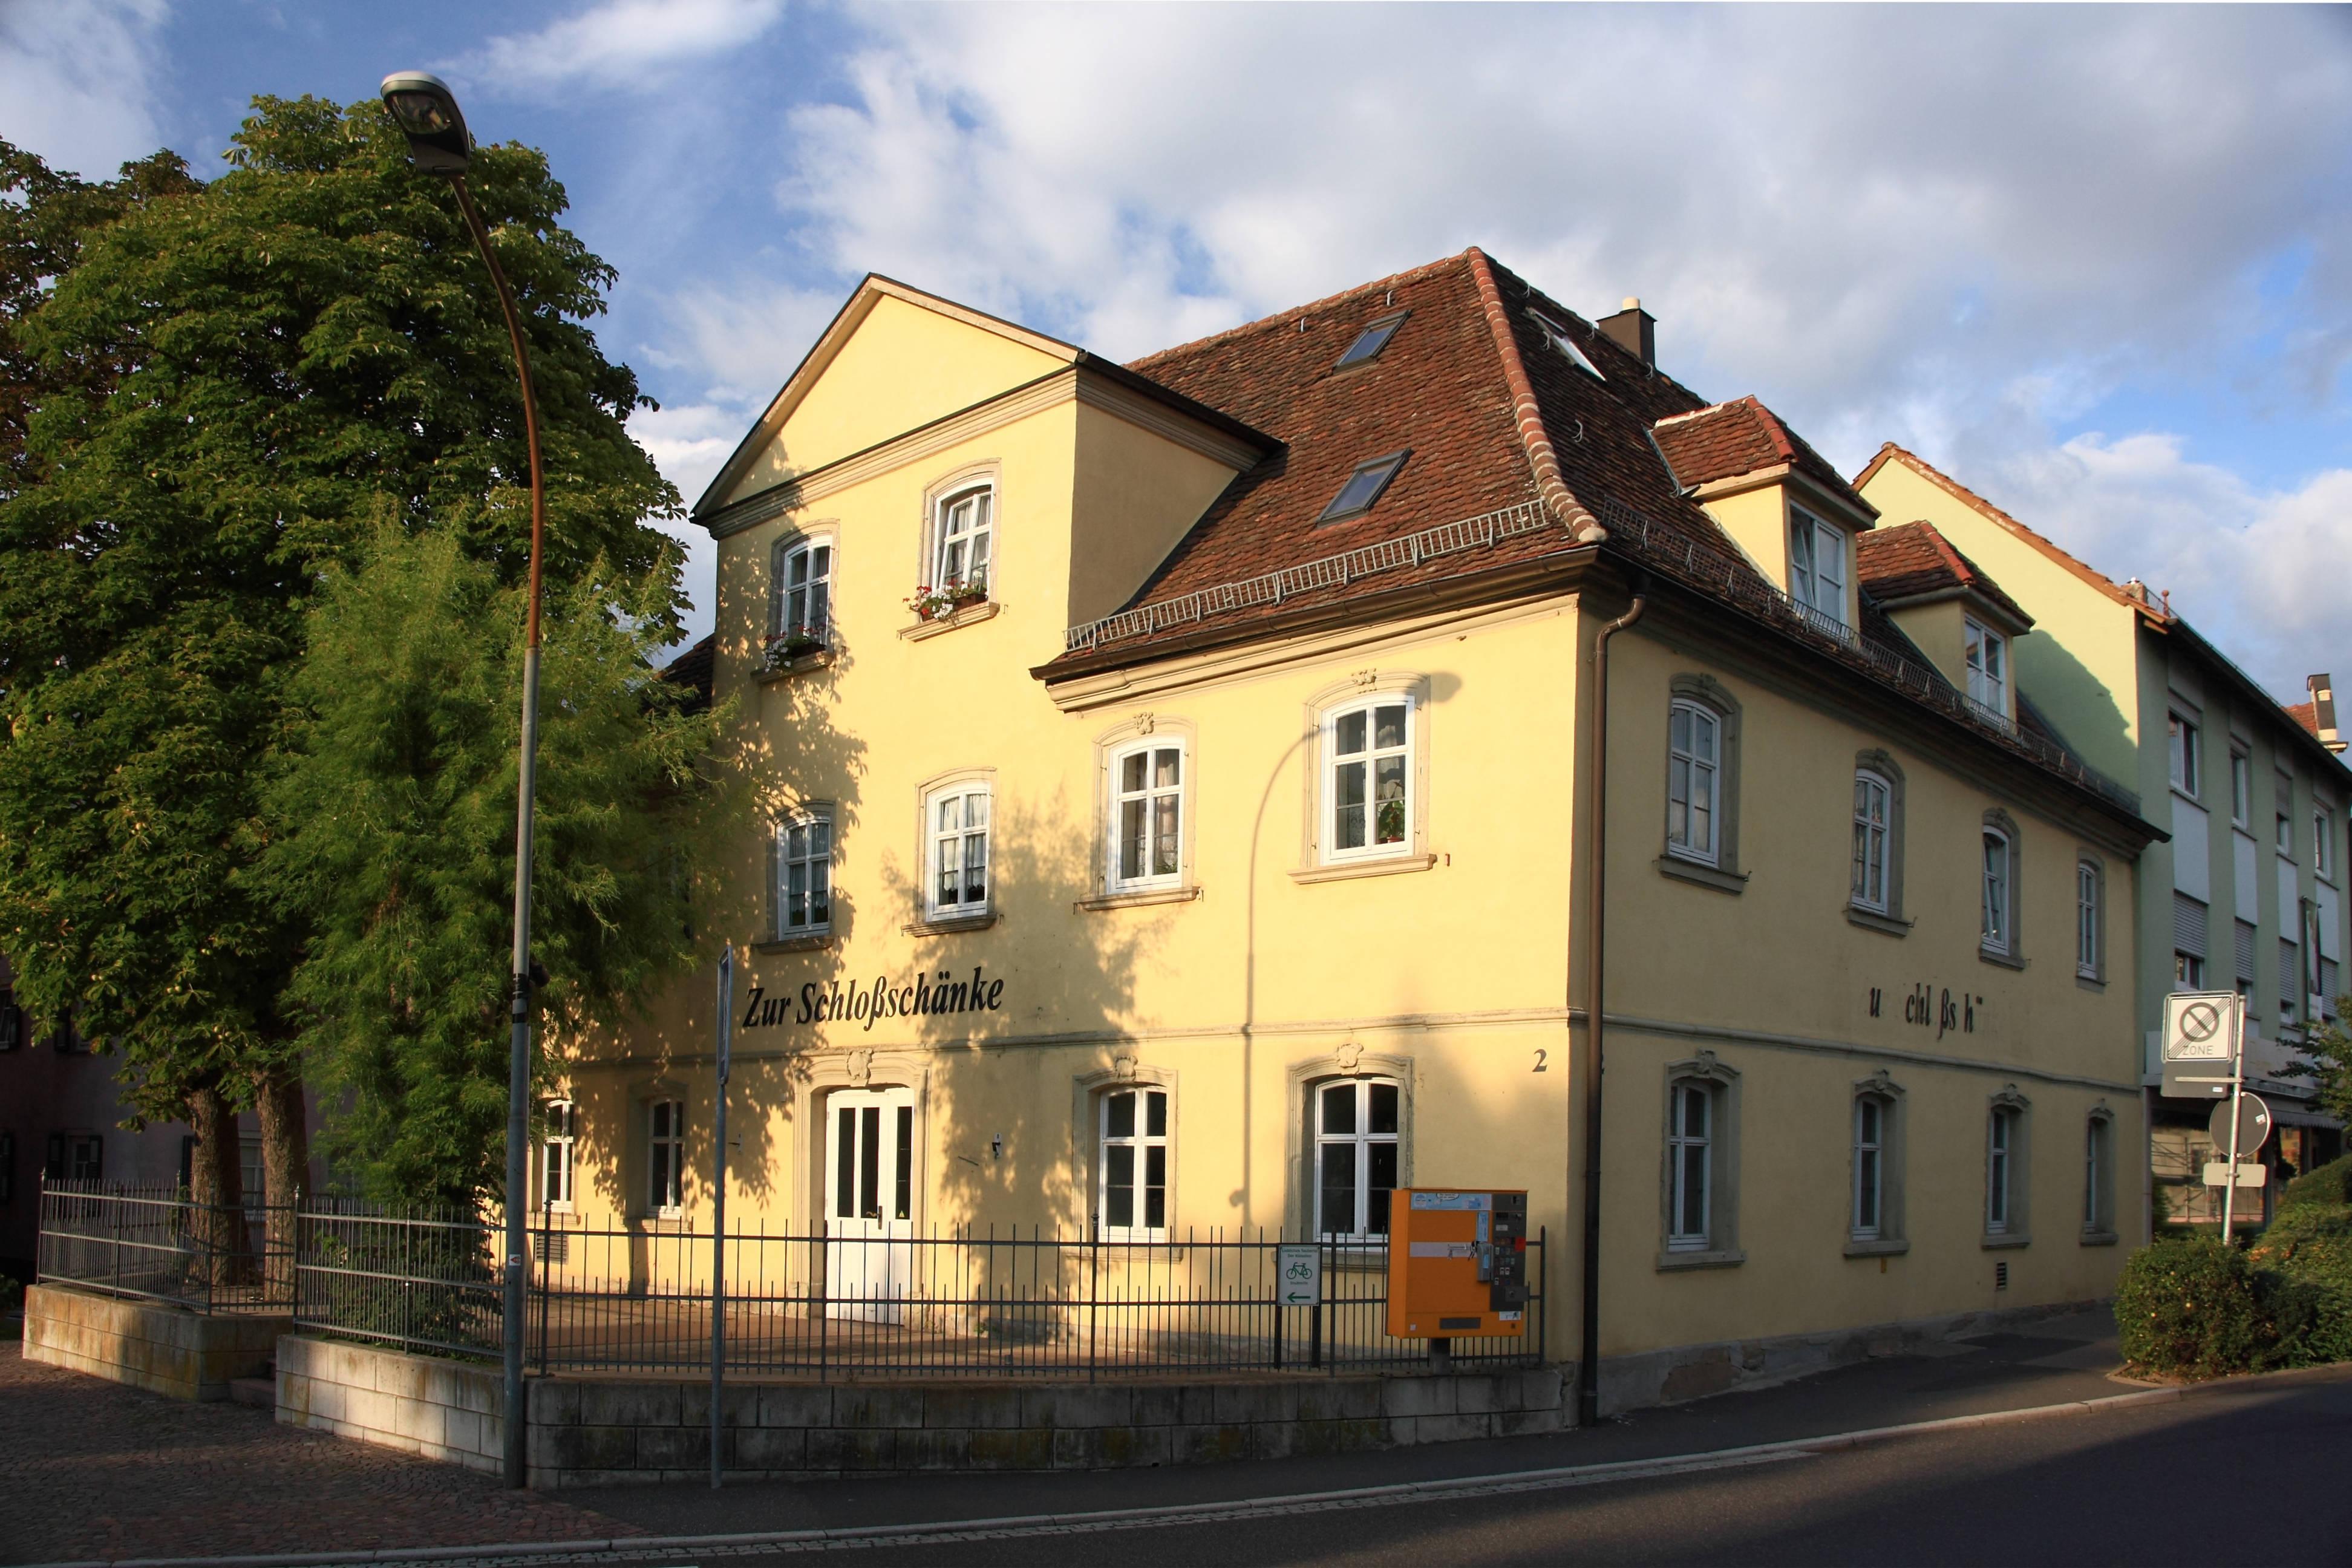 Datei:Schloßschänke Weikersheim.jpg – Wikipedia